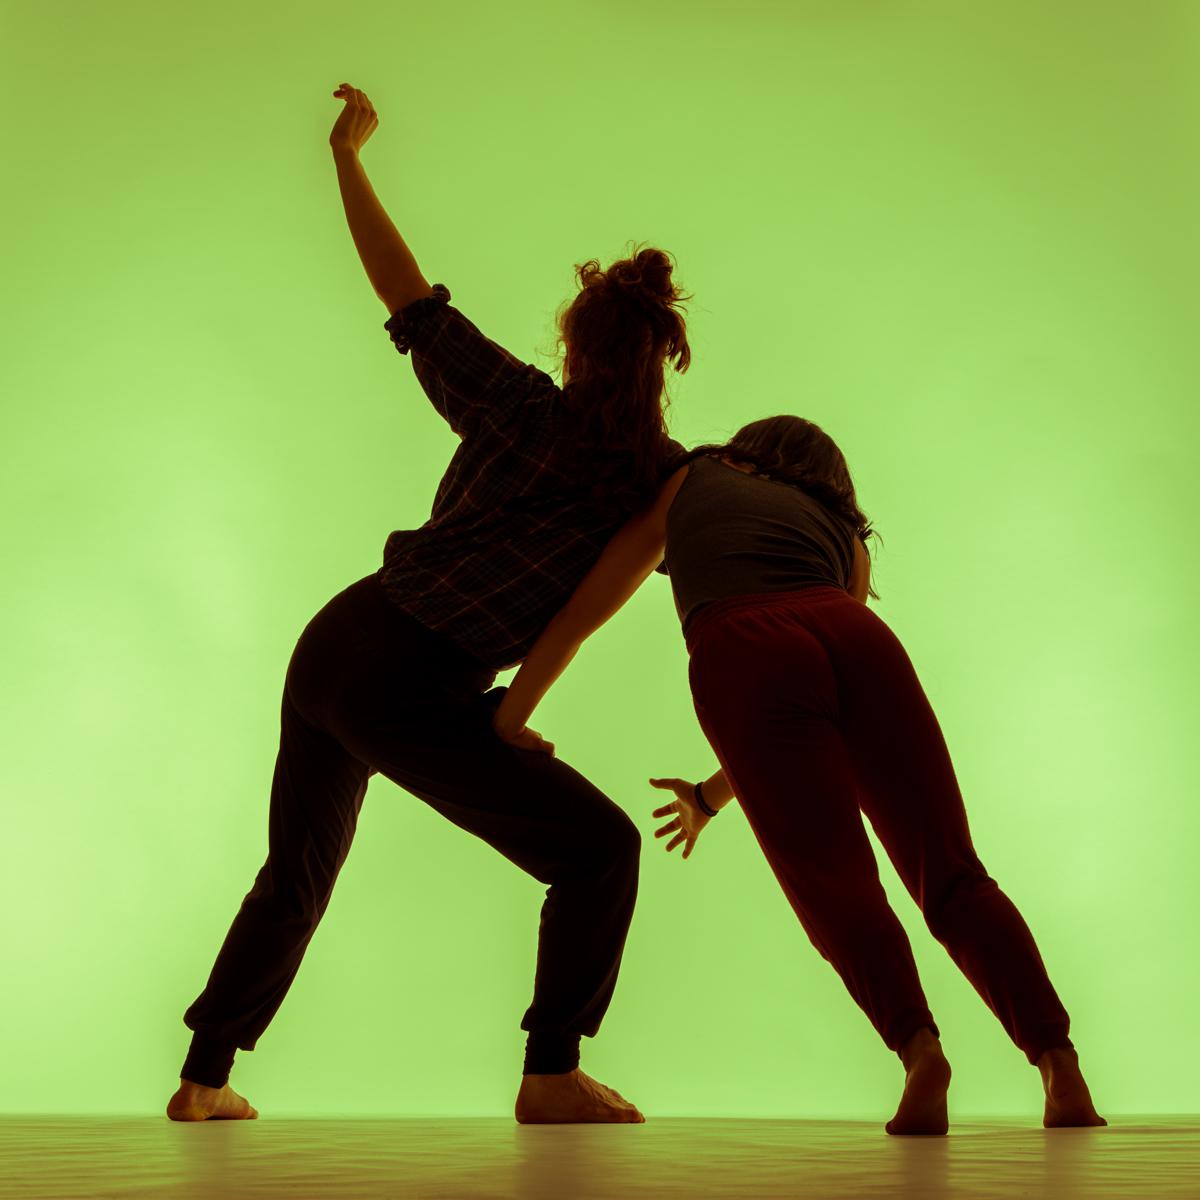 stephen-rusk-alexandra-pholien-leanne-vincent-contemporary-dance-18-10-11.jpg